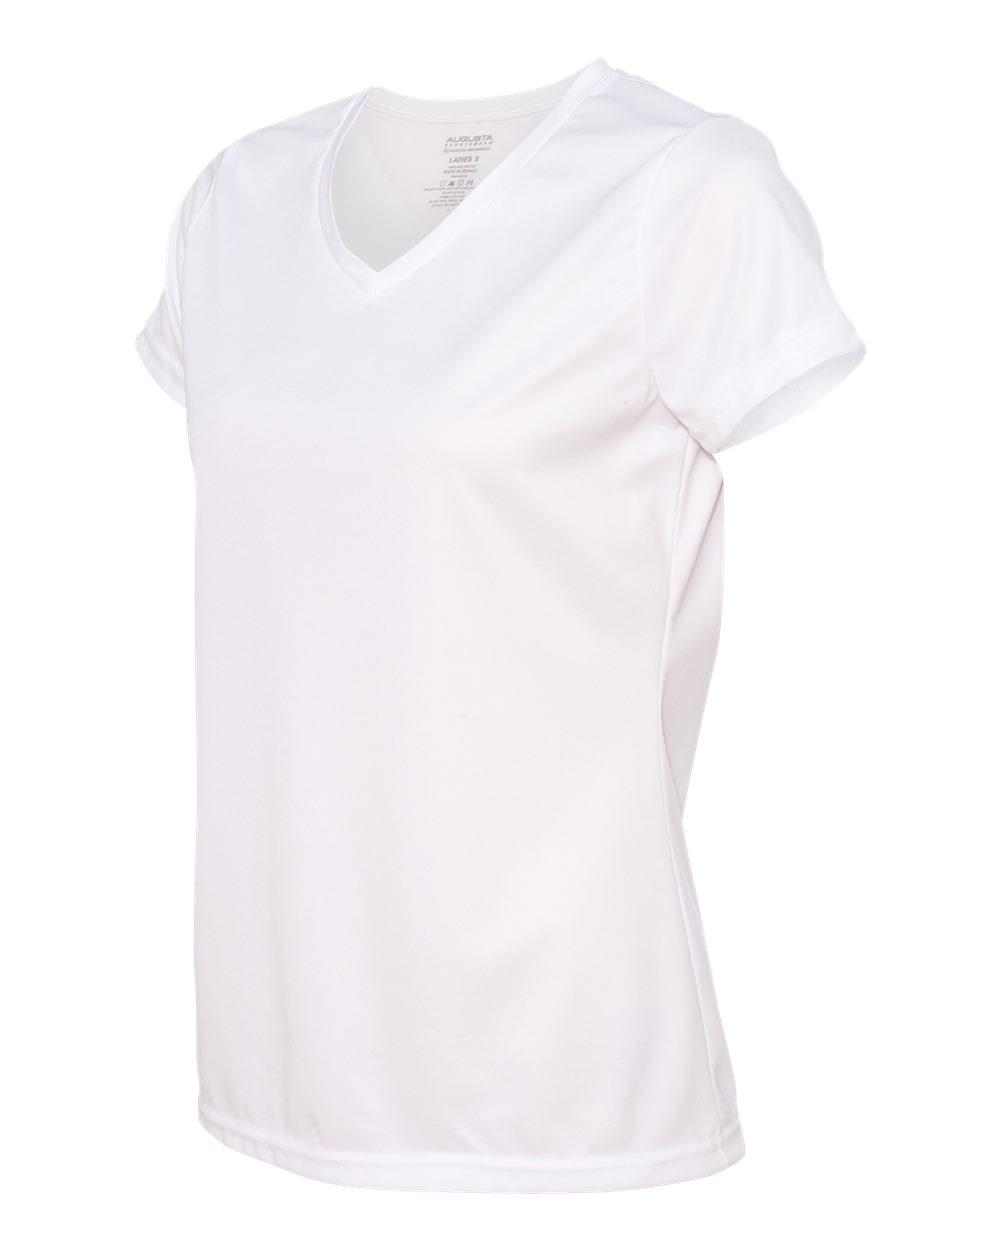 Augusta-Sportswear-Women-039-s-Moisture-Wicking-V-Neck-T-Shirt-1790-XS-2XL thumbnail 33